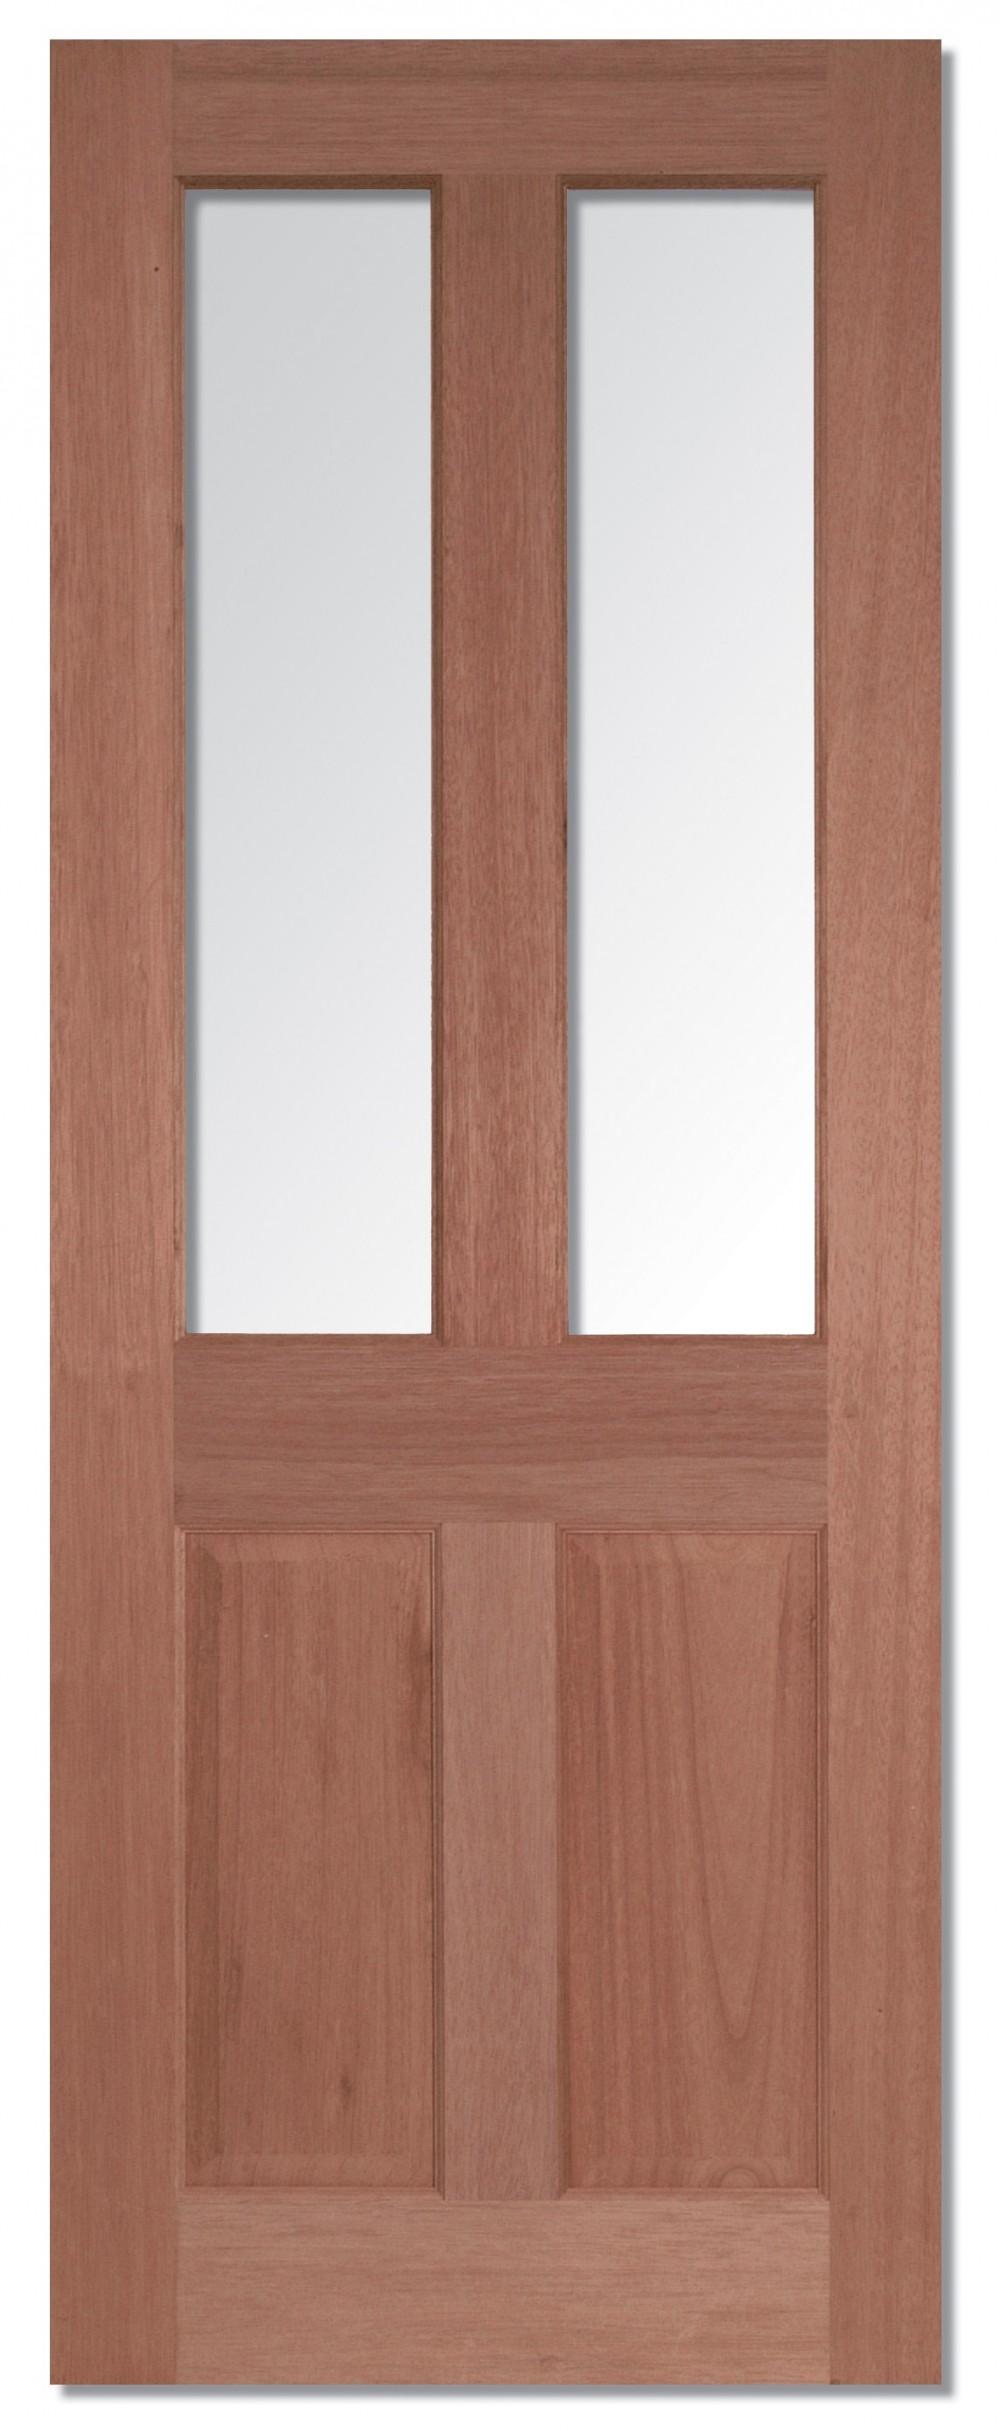 Malton Hardwood Obscure Double Glazed Trading Doors